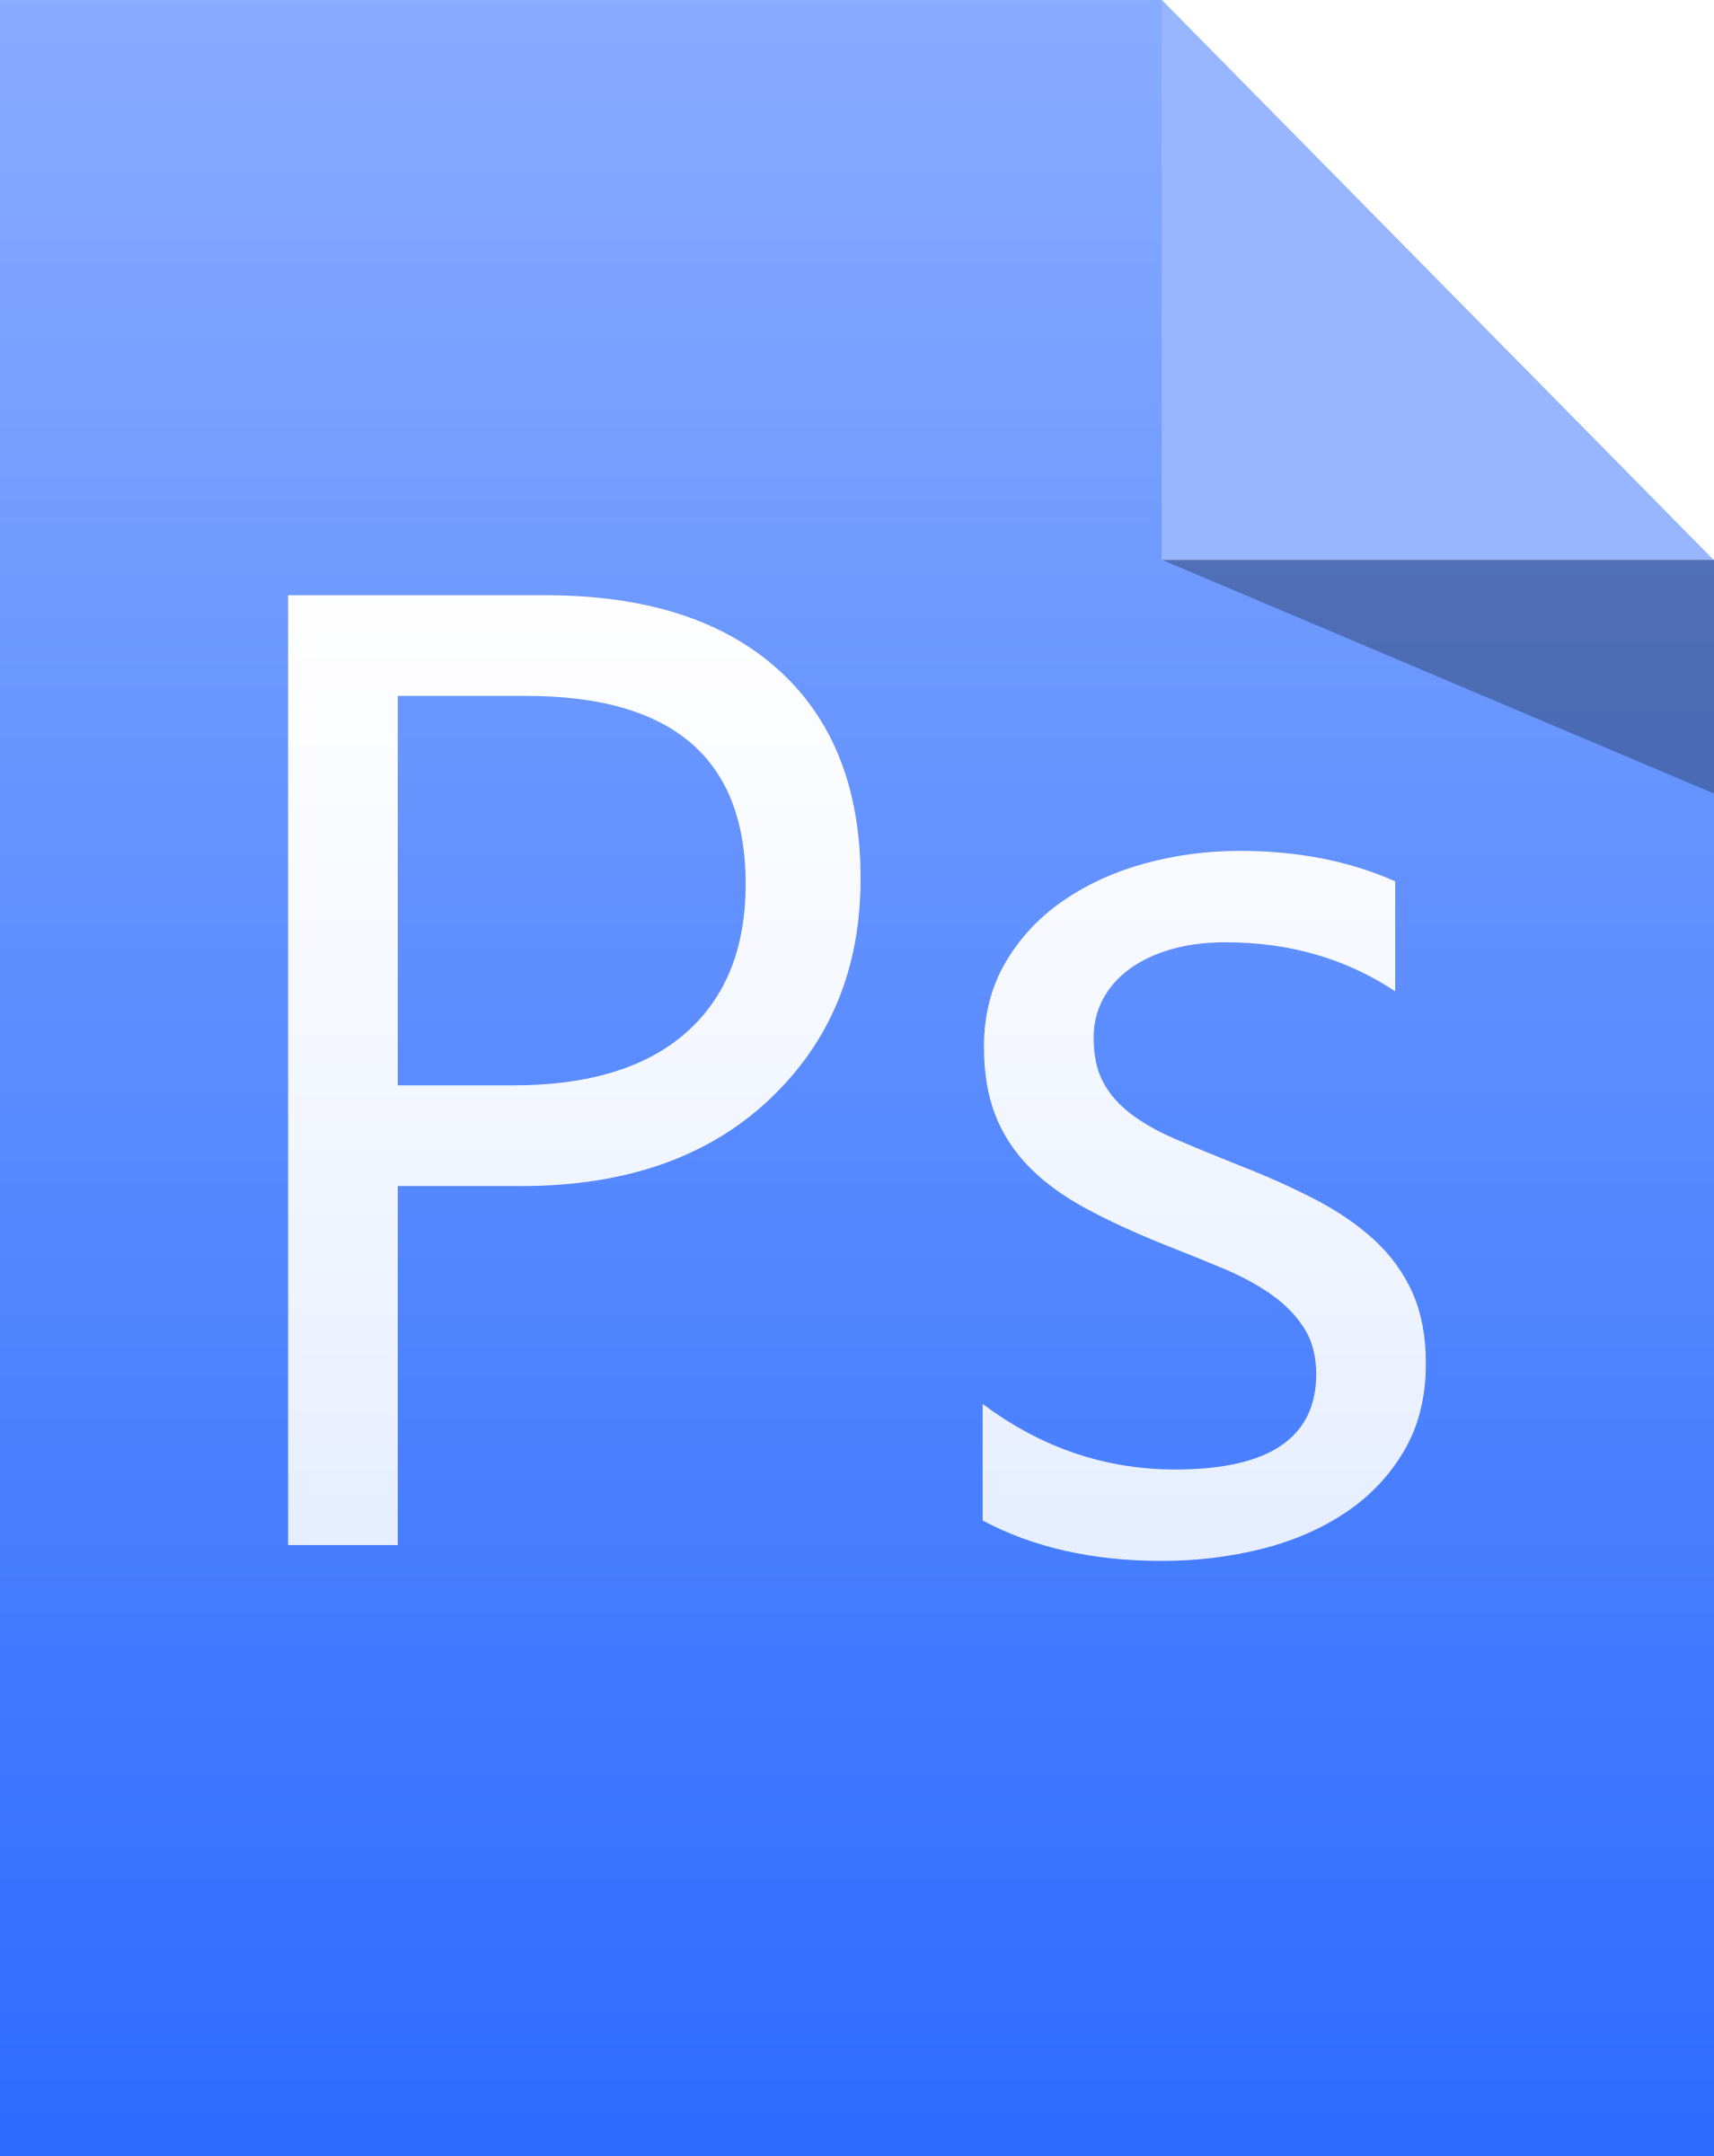 Photoshop clipart Clip Photoshop Clip #15 Photoshop